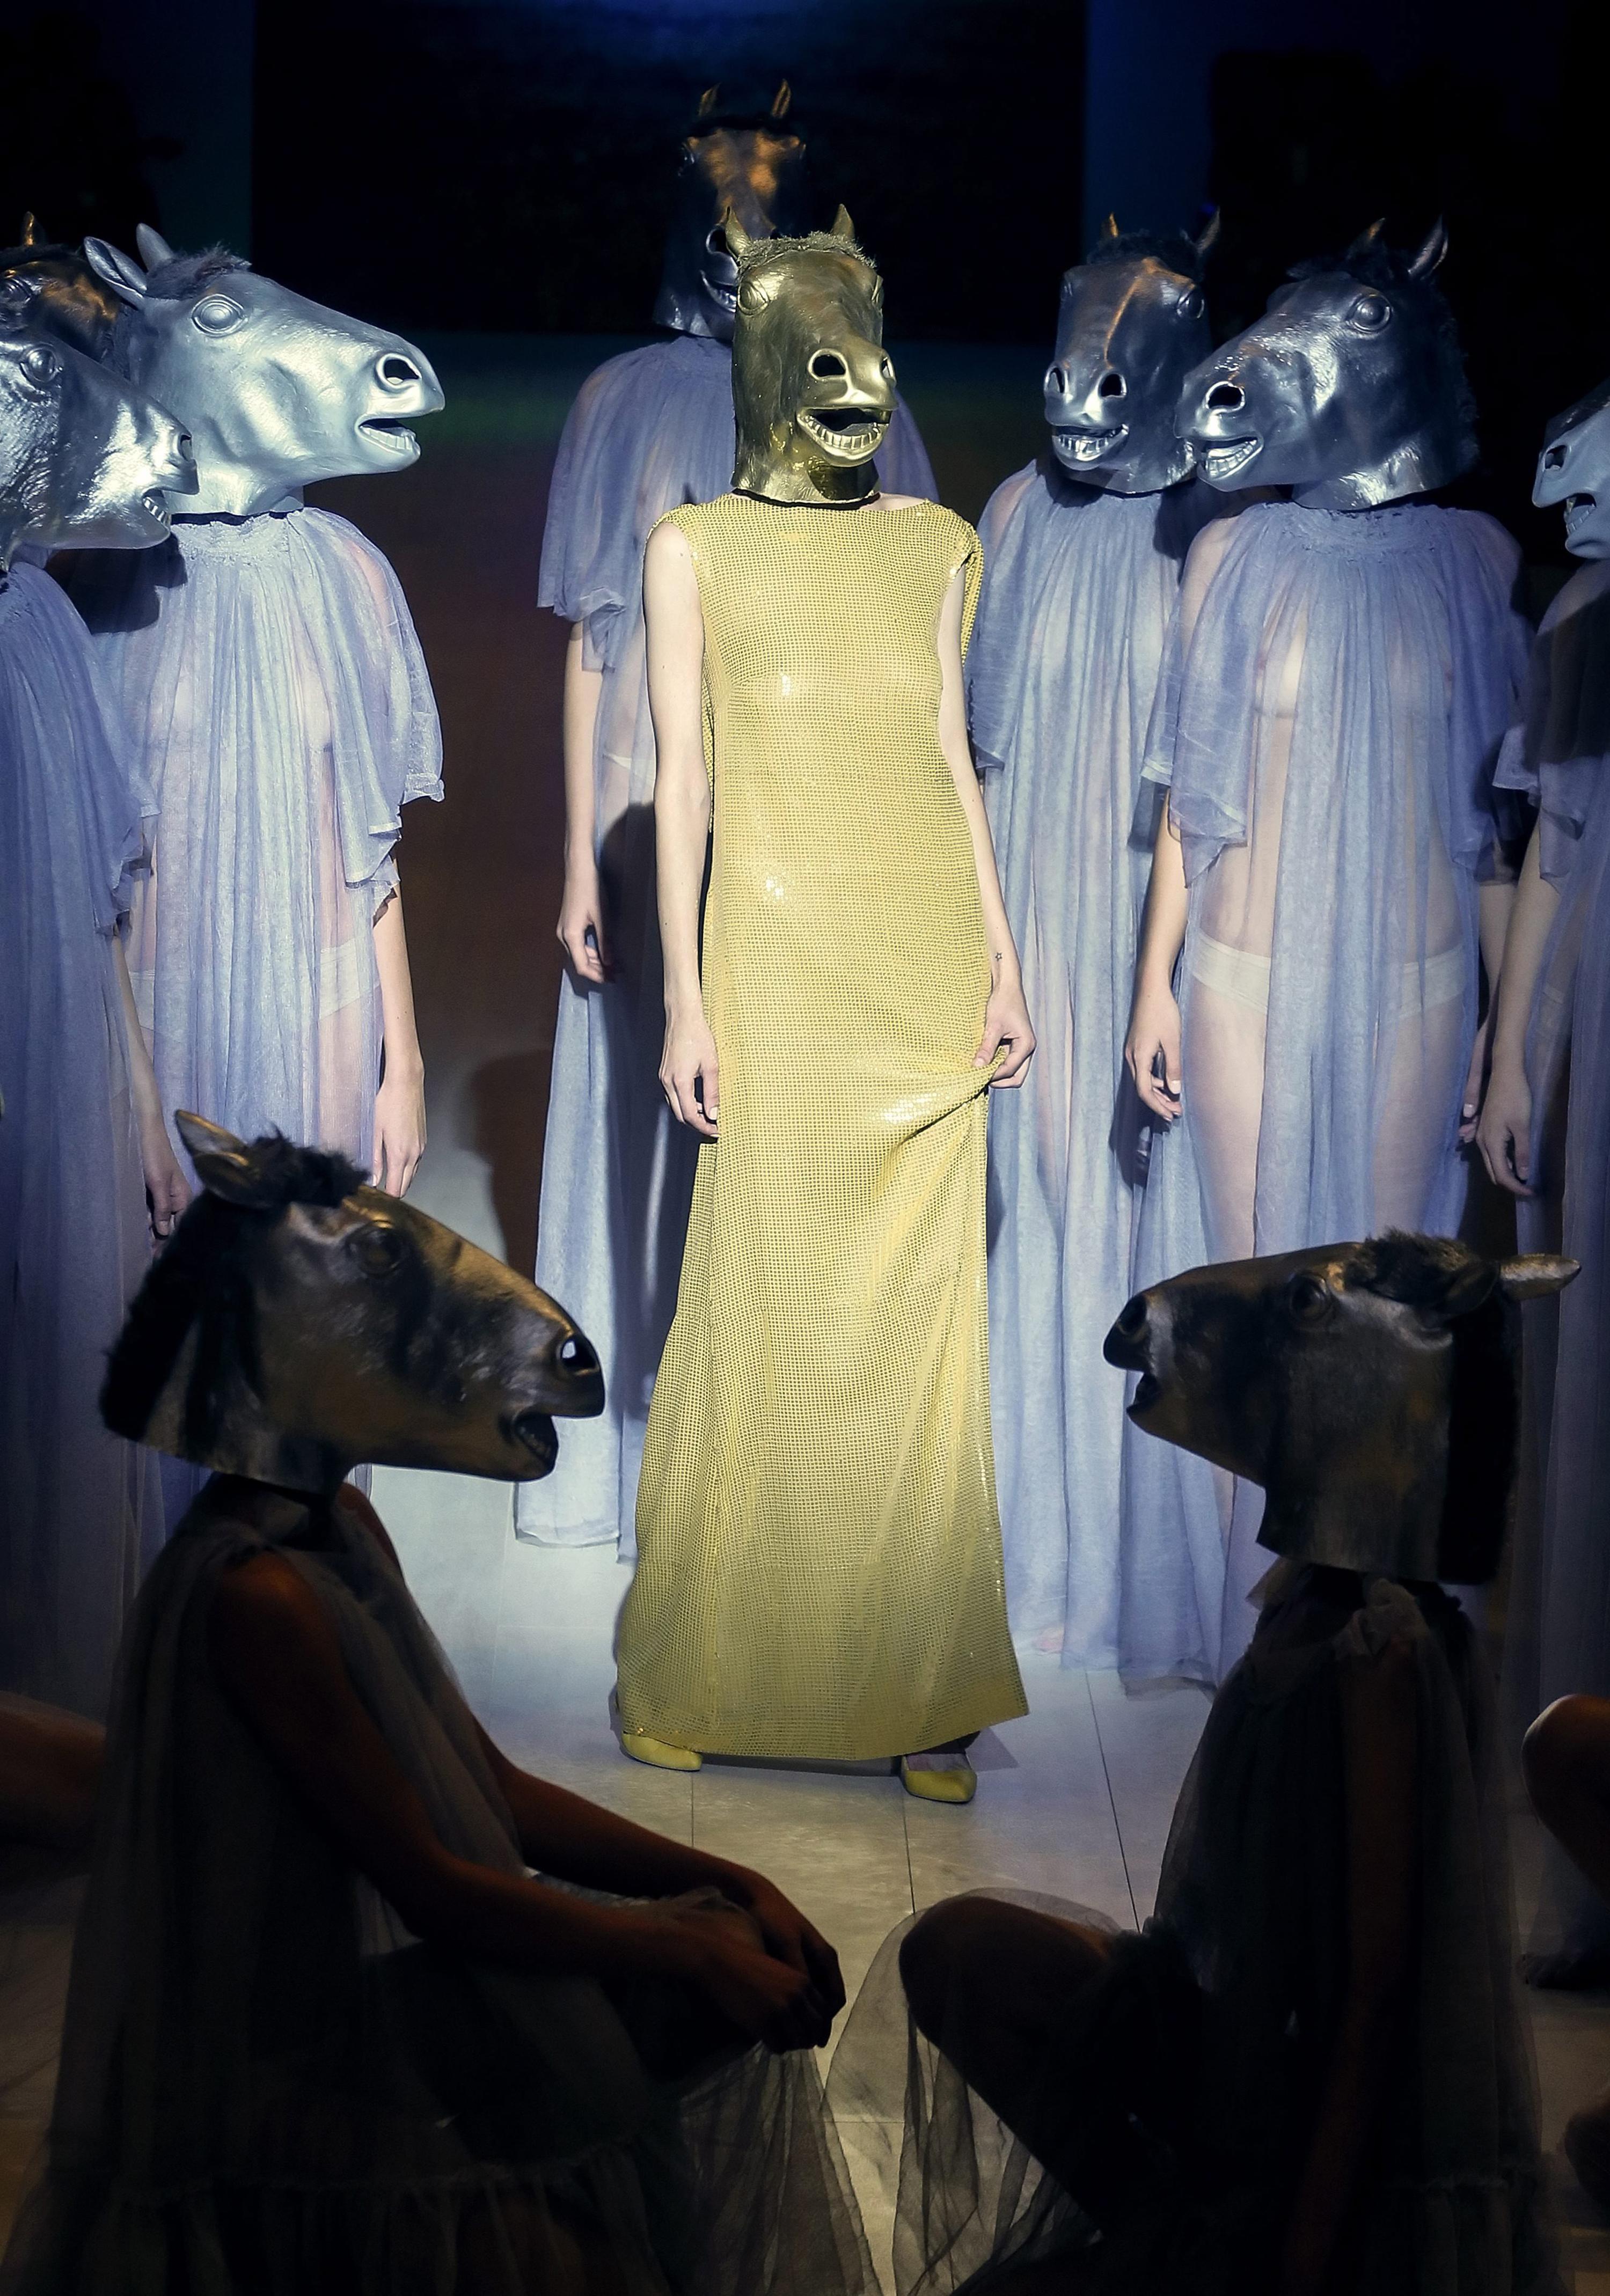 Models present creations by Ukrainian designer Victoria Gres during the Ukrainian Fashion Week in Kiev, Ukraine on Oct. 15, 2014.